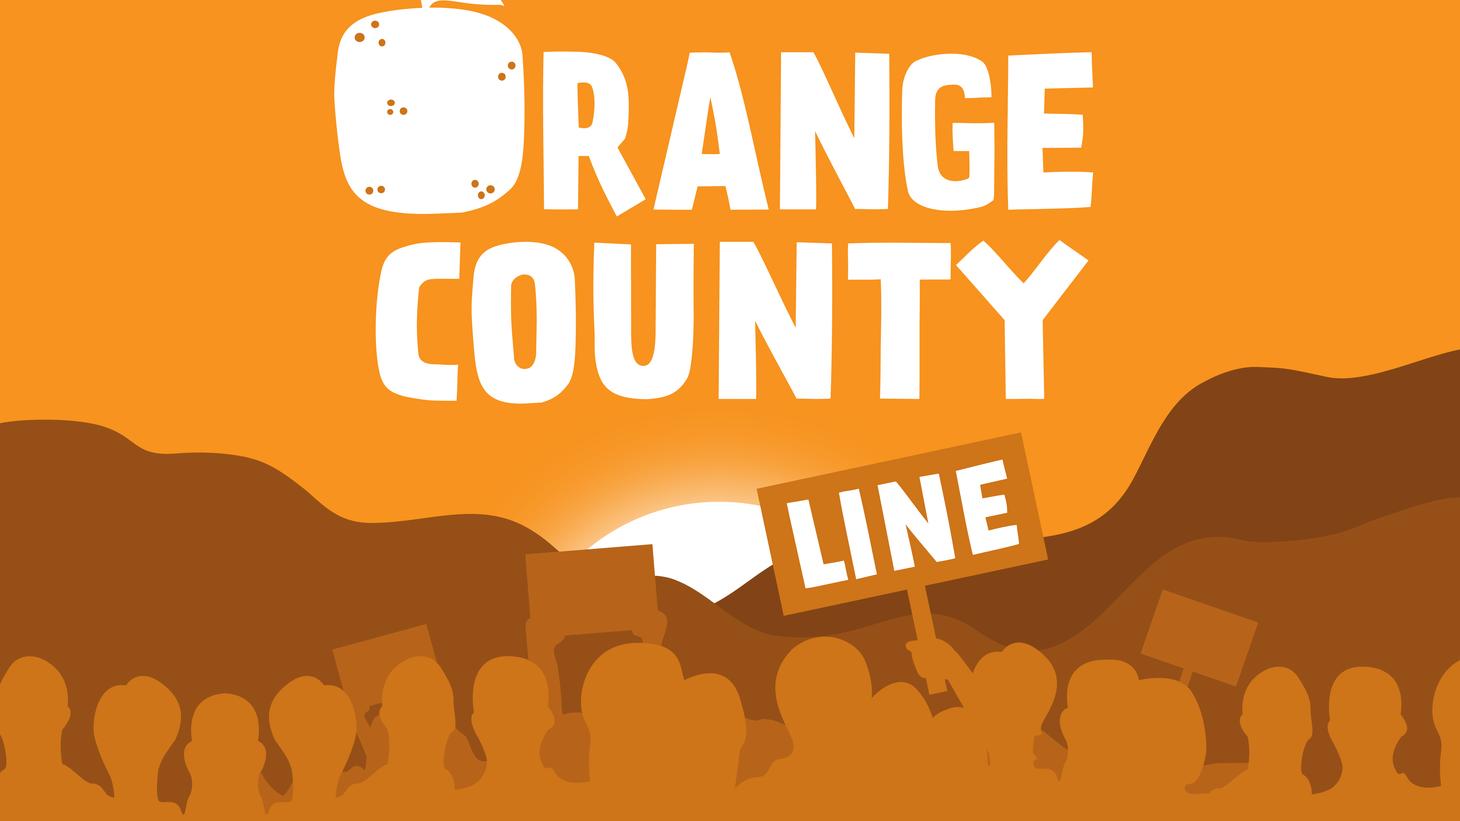 The spreading movement in Orange County.